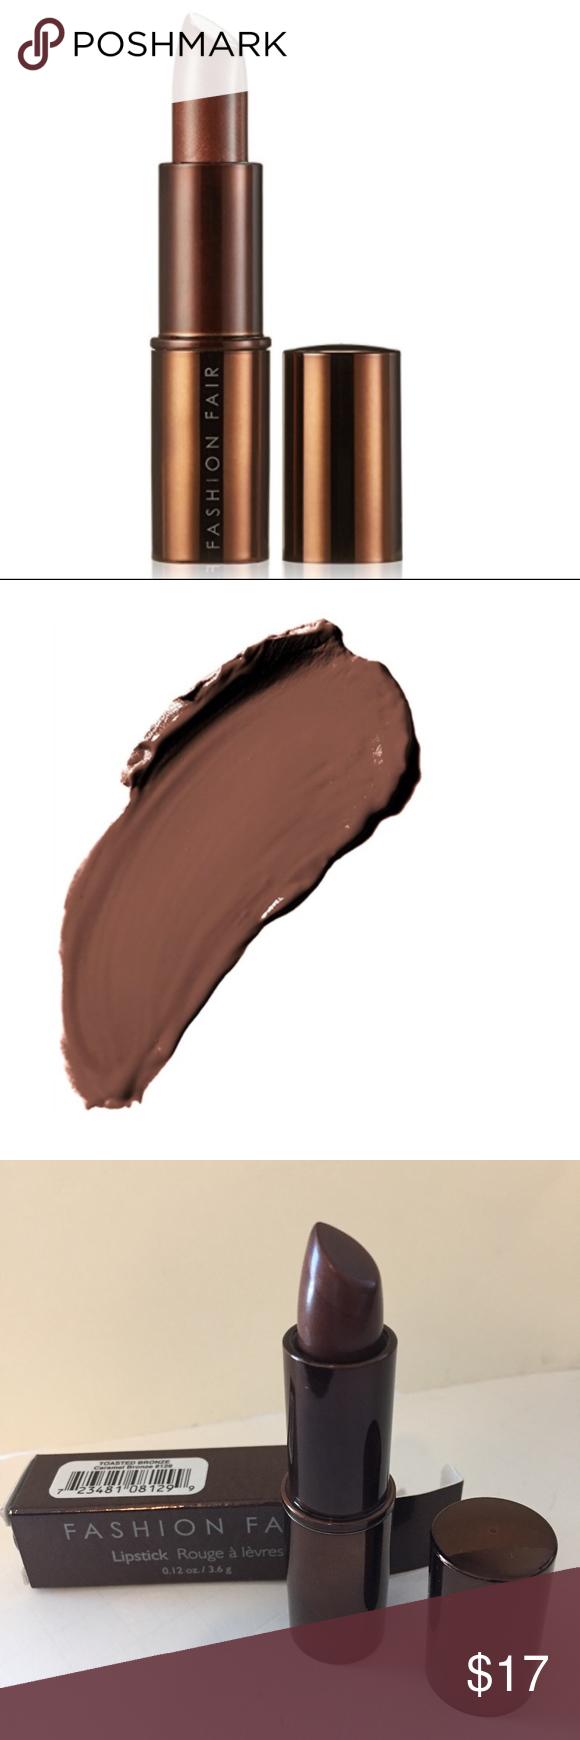 FASHION FAIR Lipstick Full size Toasted Bronze FASHION